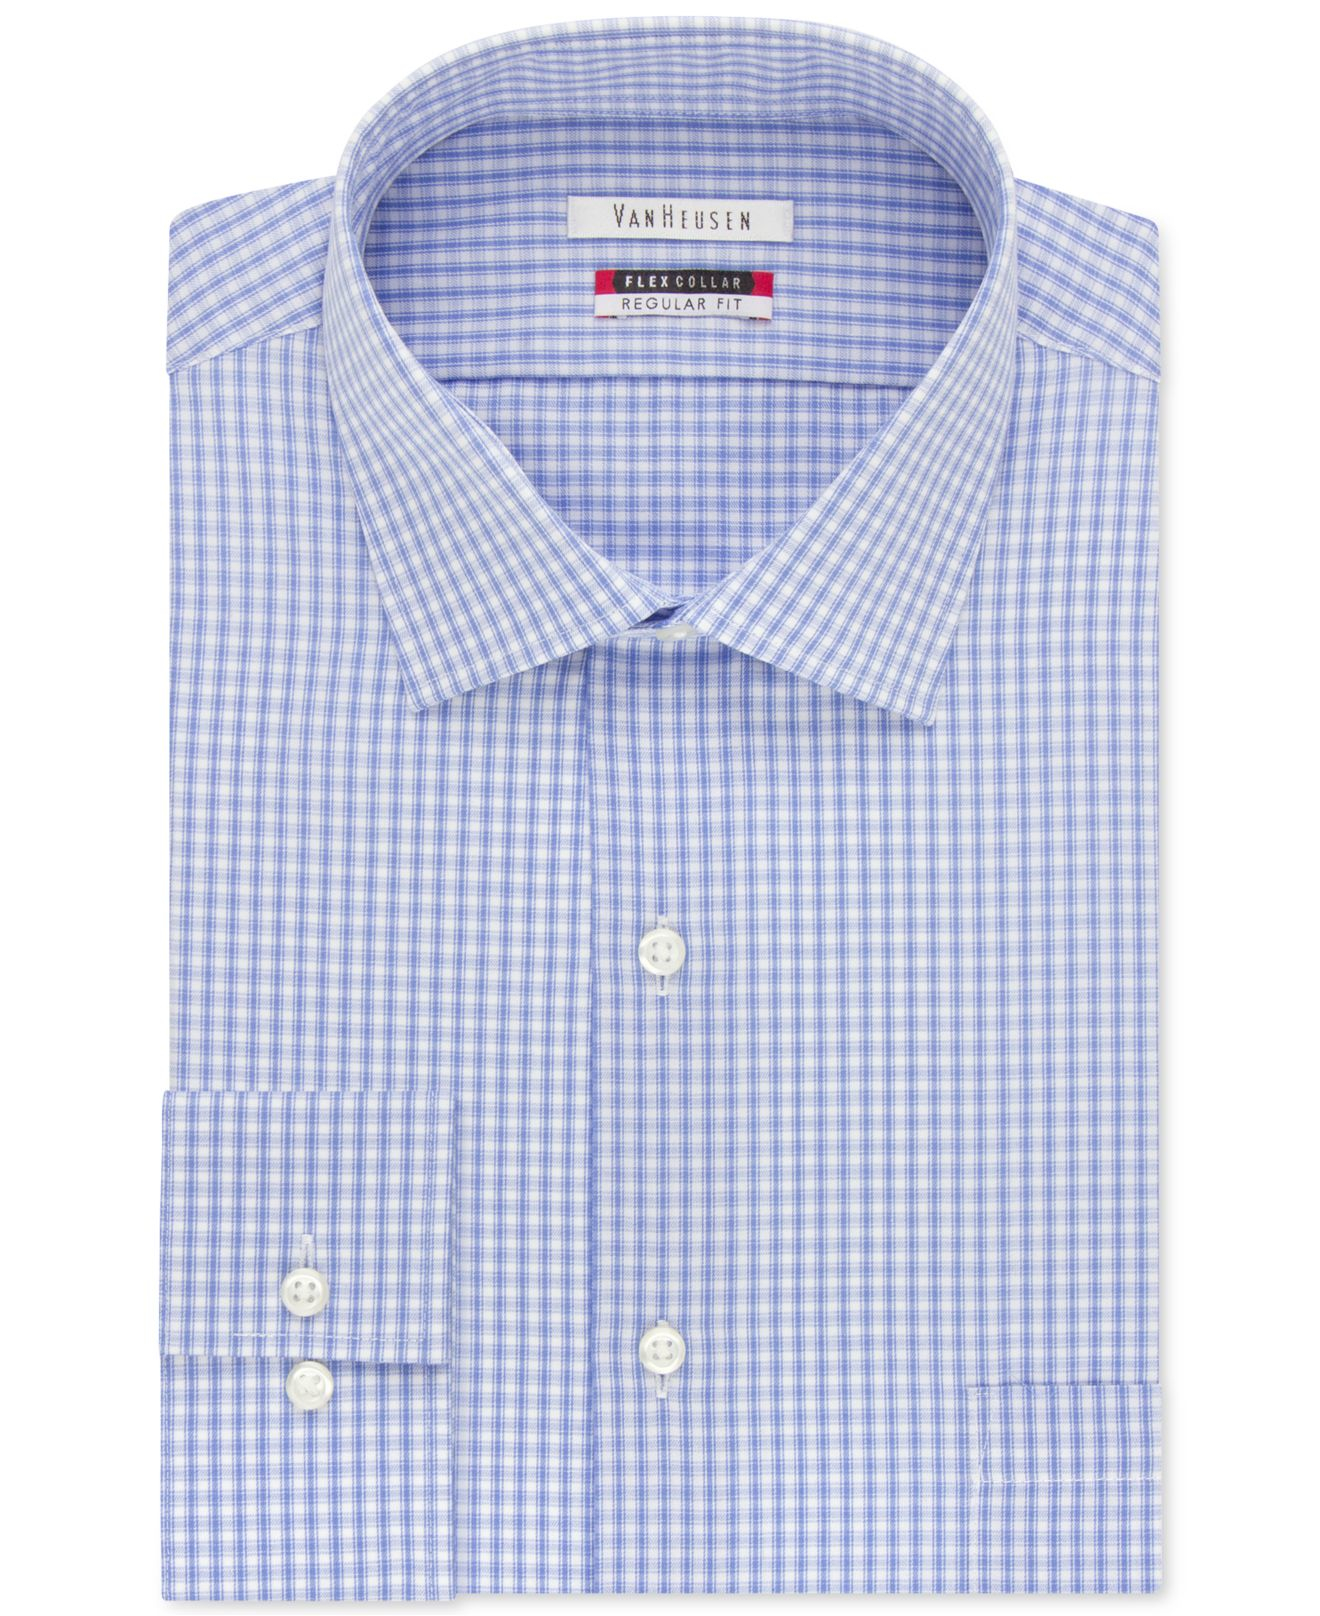 27ad248c543 Lyst - Van Heusen Big And Tall Tek Fit Collar Check Dress Shirt in ...